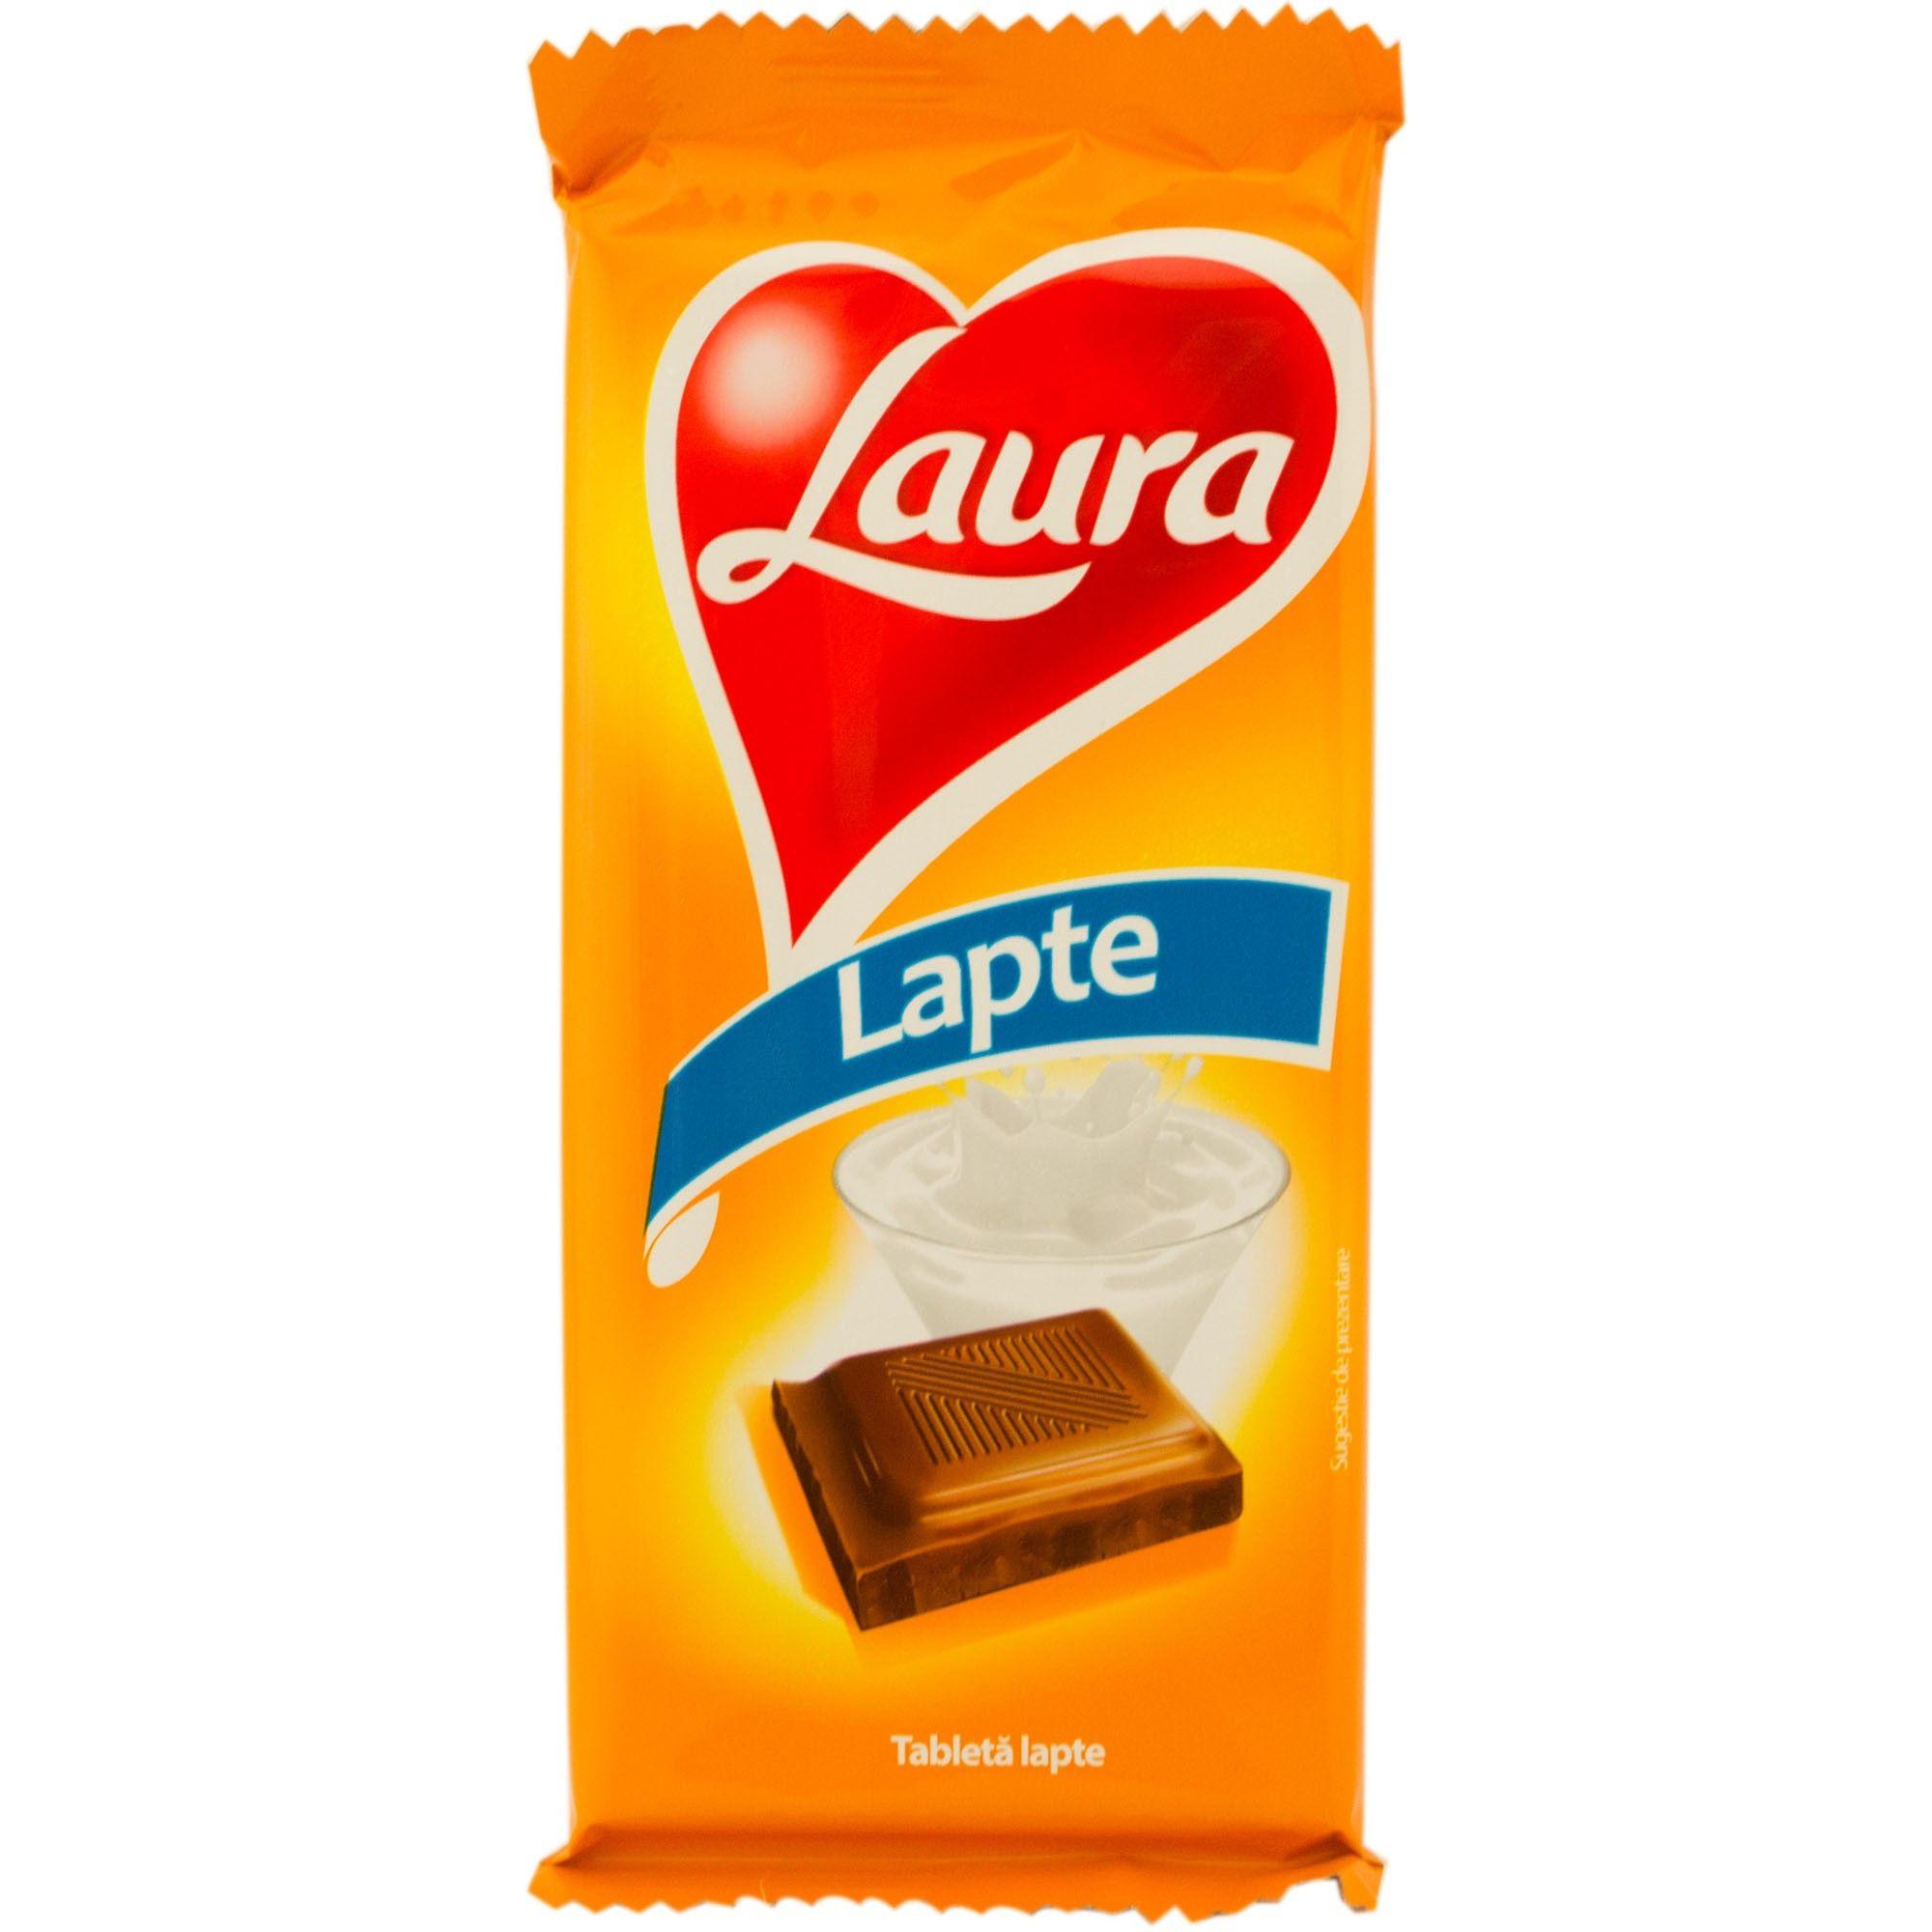 Laura - Ciocolata cu lapte